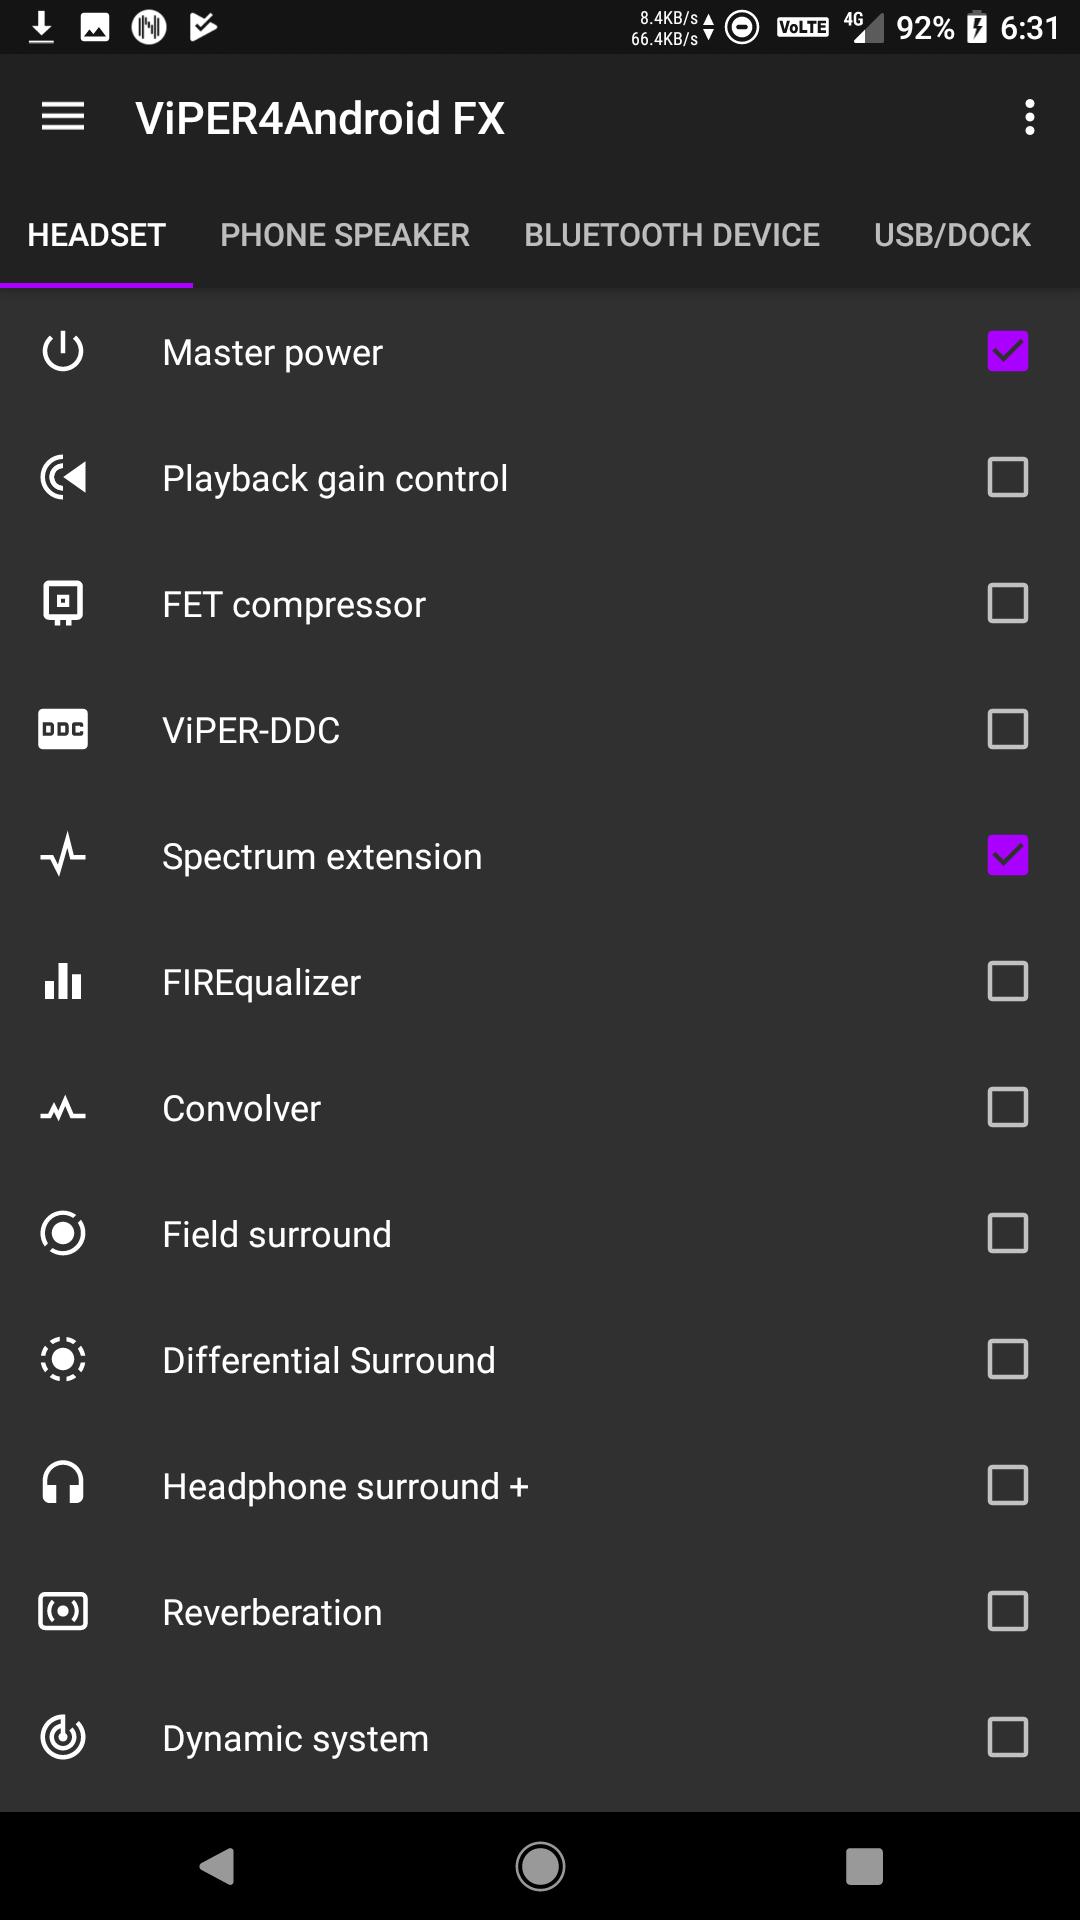 Screenshot_ViPER4Android_FX_20180911-183141.png